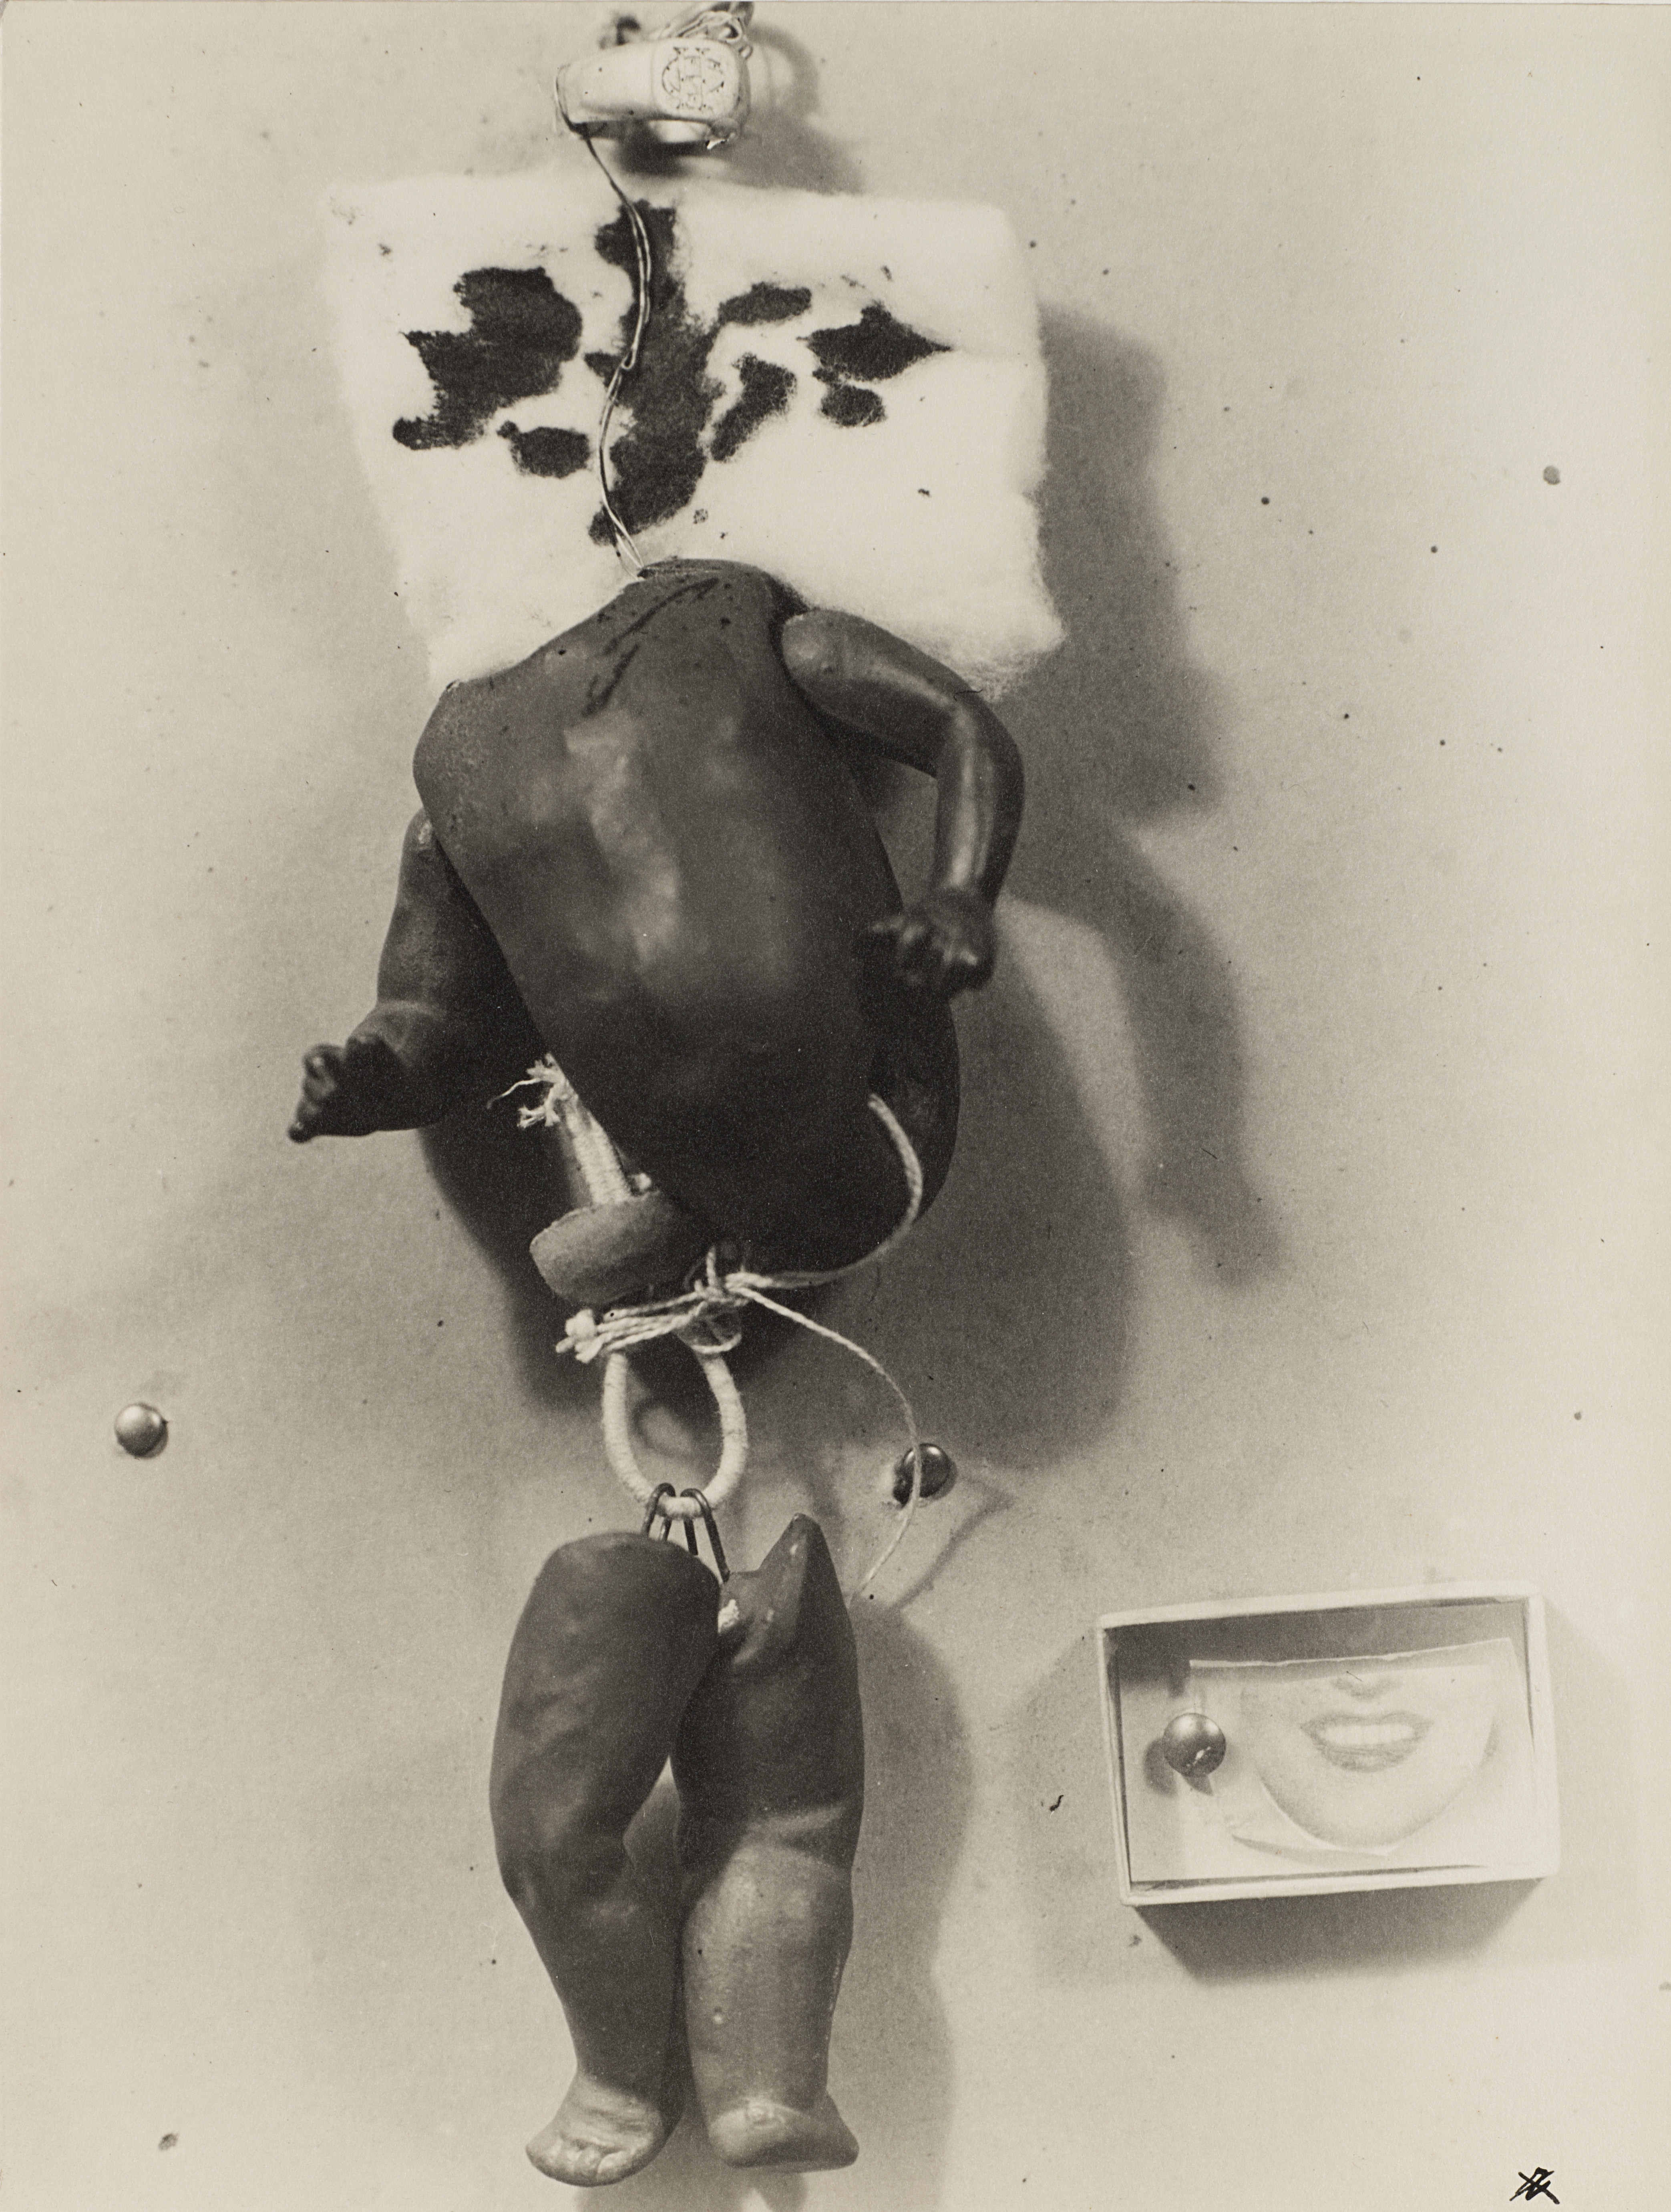 Object Par Camille Bryen, Raoul Ubac. 1935-1936, Vintage silver salt gelatin print applied on original cardboard, 29 x 22.5 cm (40 x 30 cm cardboard), € 10.000 - 12.000. Photo: Finarte